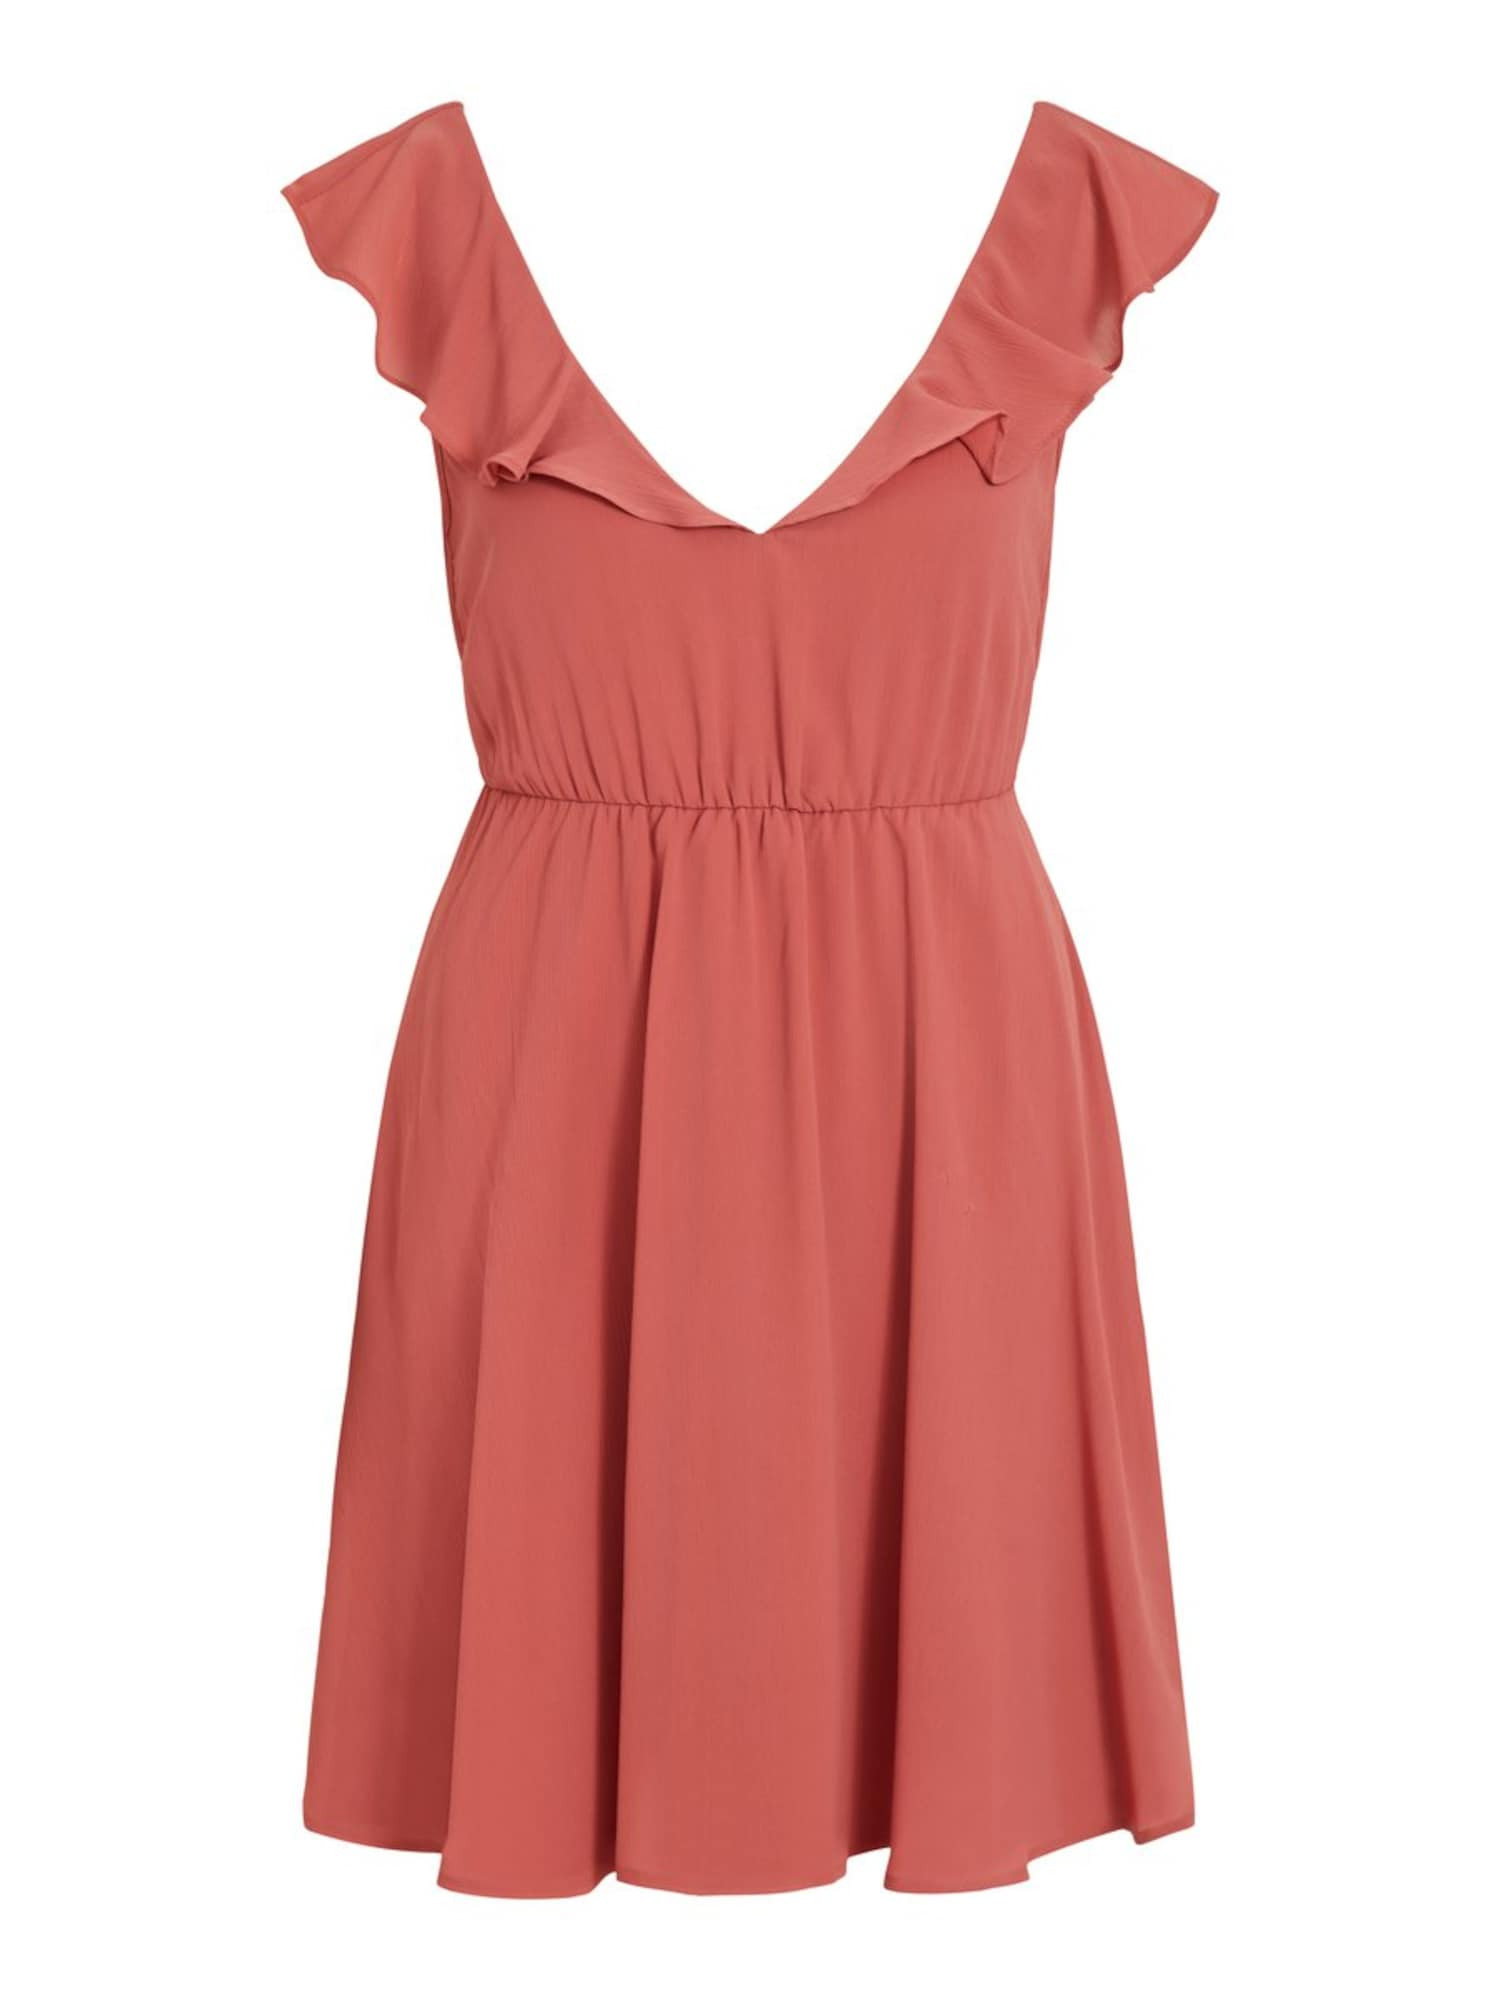 15 Großartig Kleid 34 Design13 Großartig Kleid 34 Design